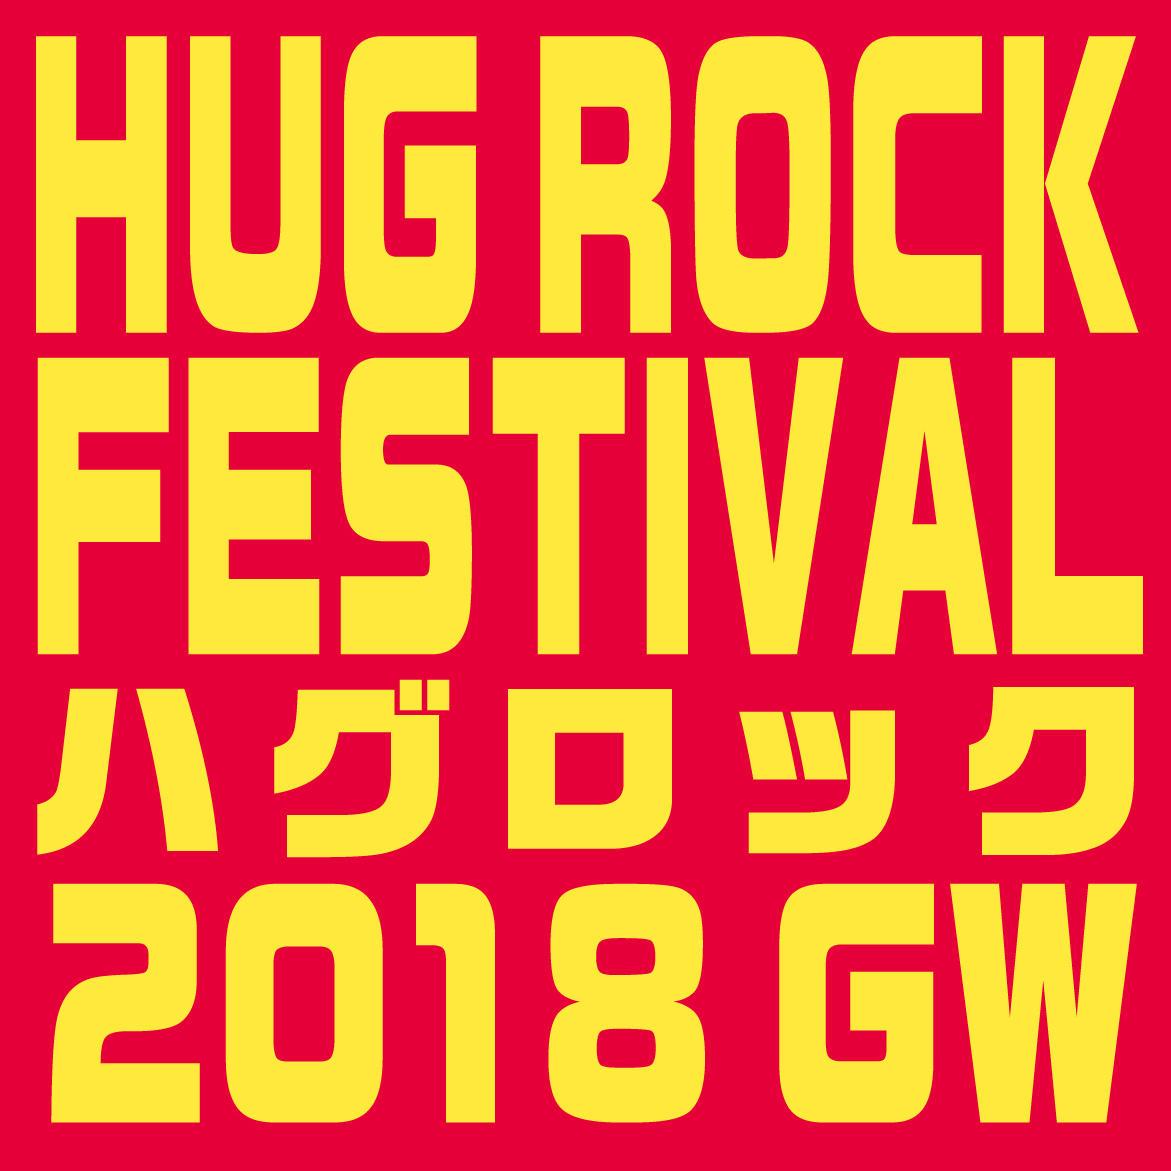 HUG ROCK FESTIVAL 2018 GW